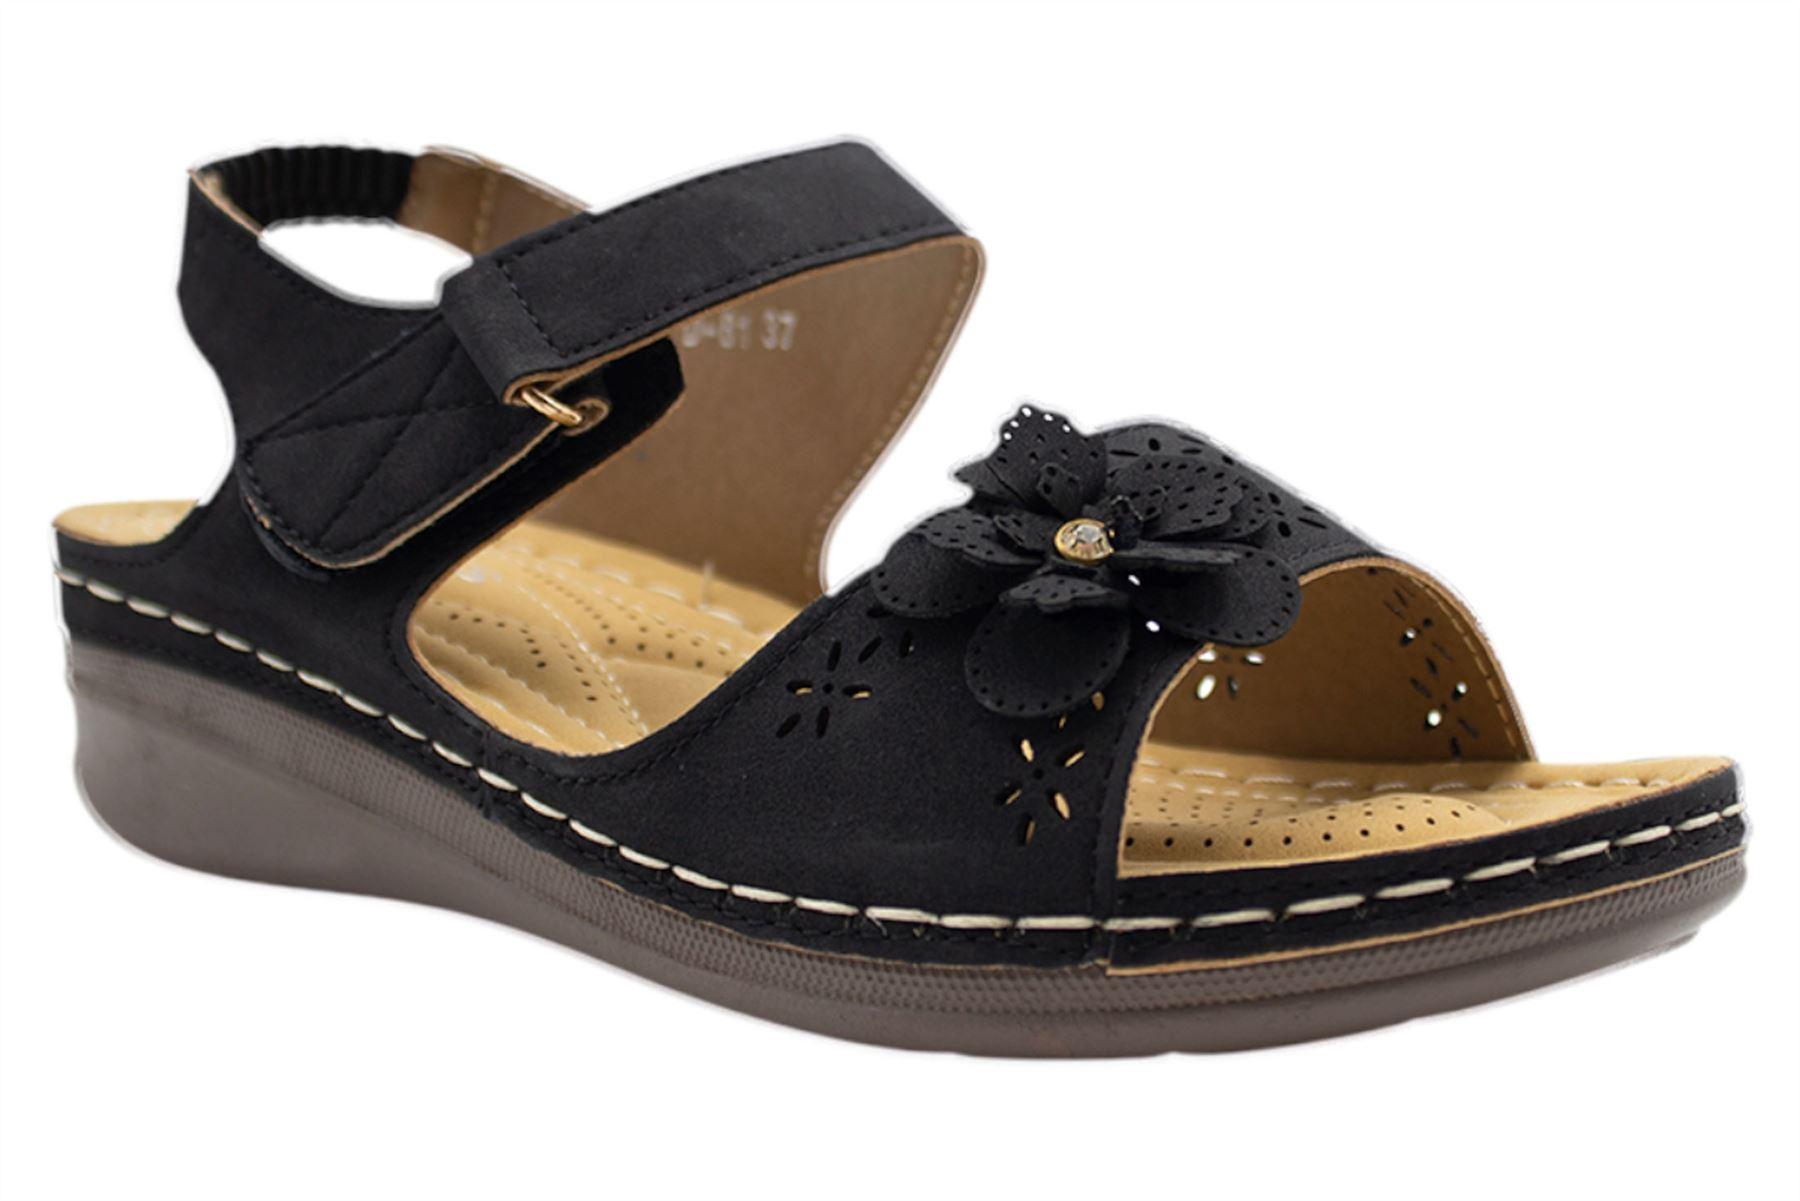 Ladies-Sandals-Womens-Mid-Heel-Comfort-Summer-Beach-Casual-Wear miniatura 18